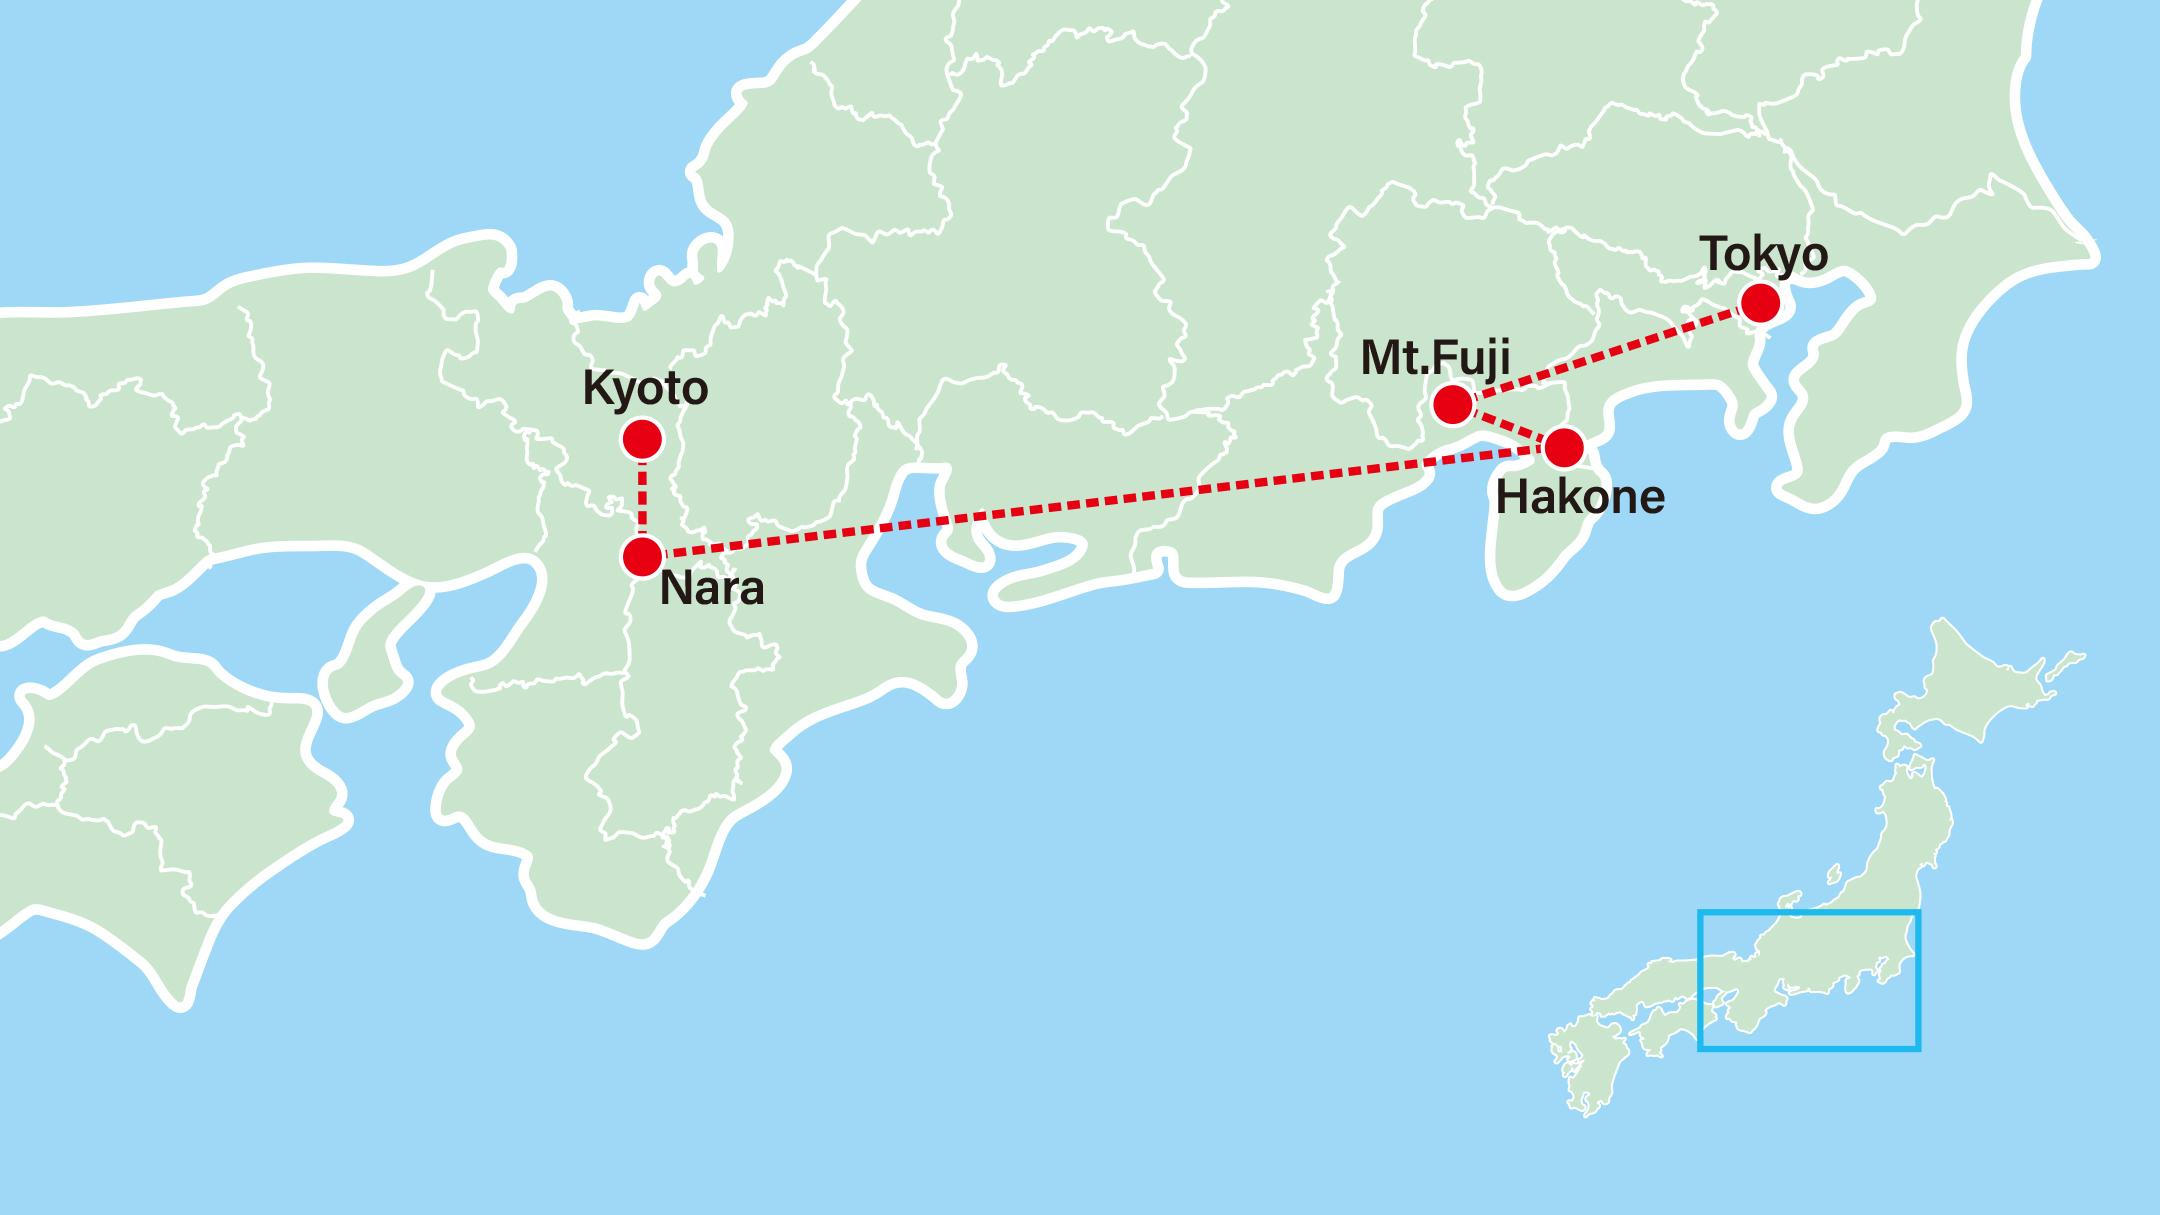 Anime Japan EXPO 2020 9 Days-Tokyo-Yokohama-Mt.Fuji-Hakone-Kyoto-Nara